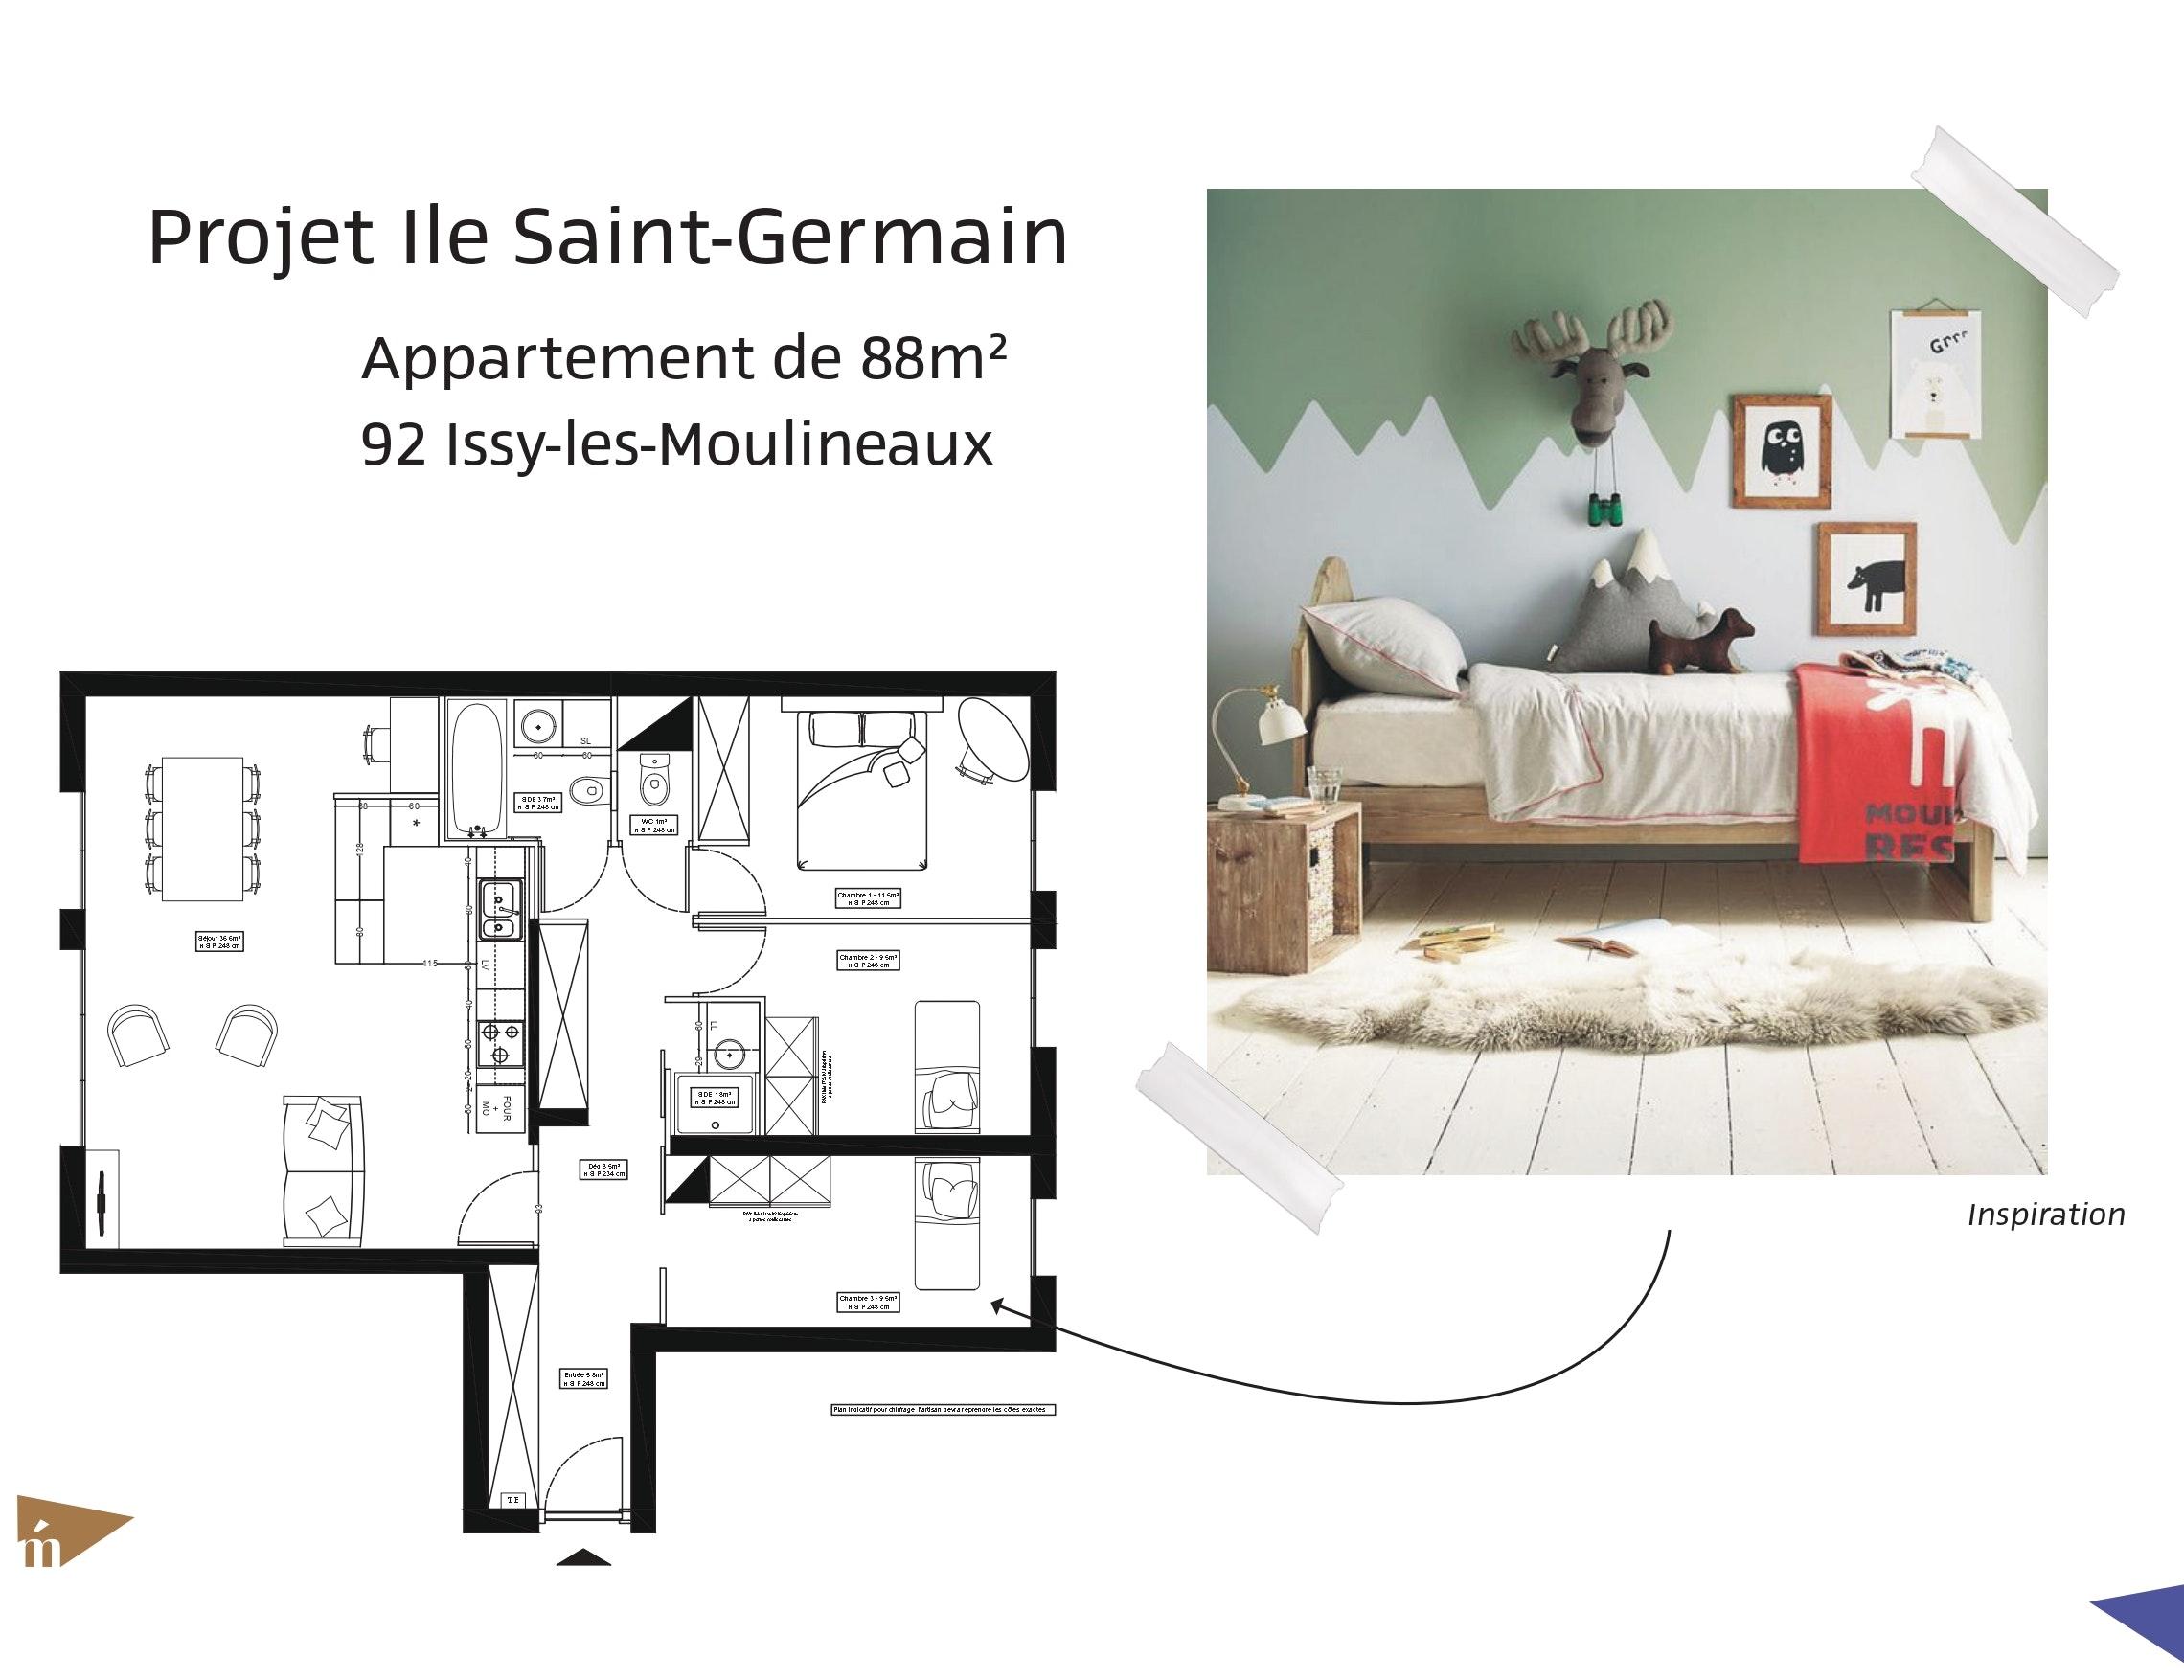 photo Projet Ile Saint-Germain - 88 m² Léa Mast - Architecte hemea